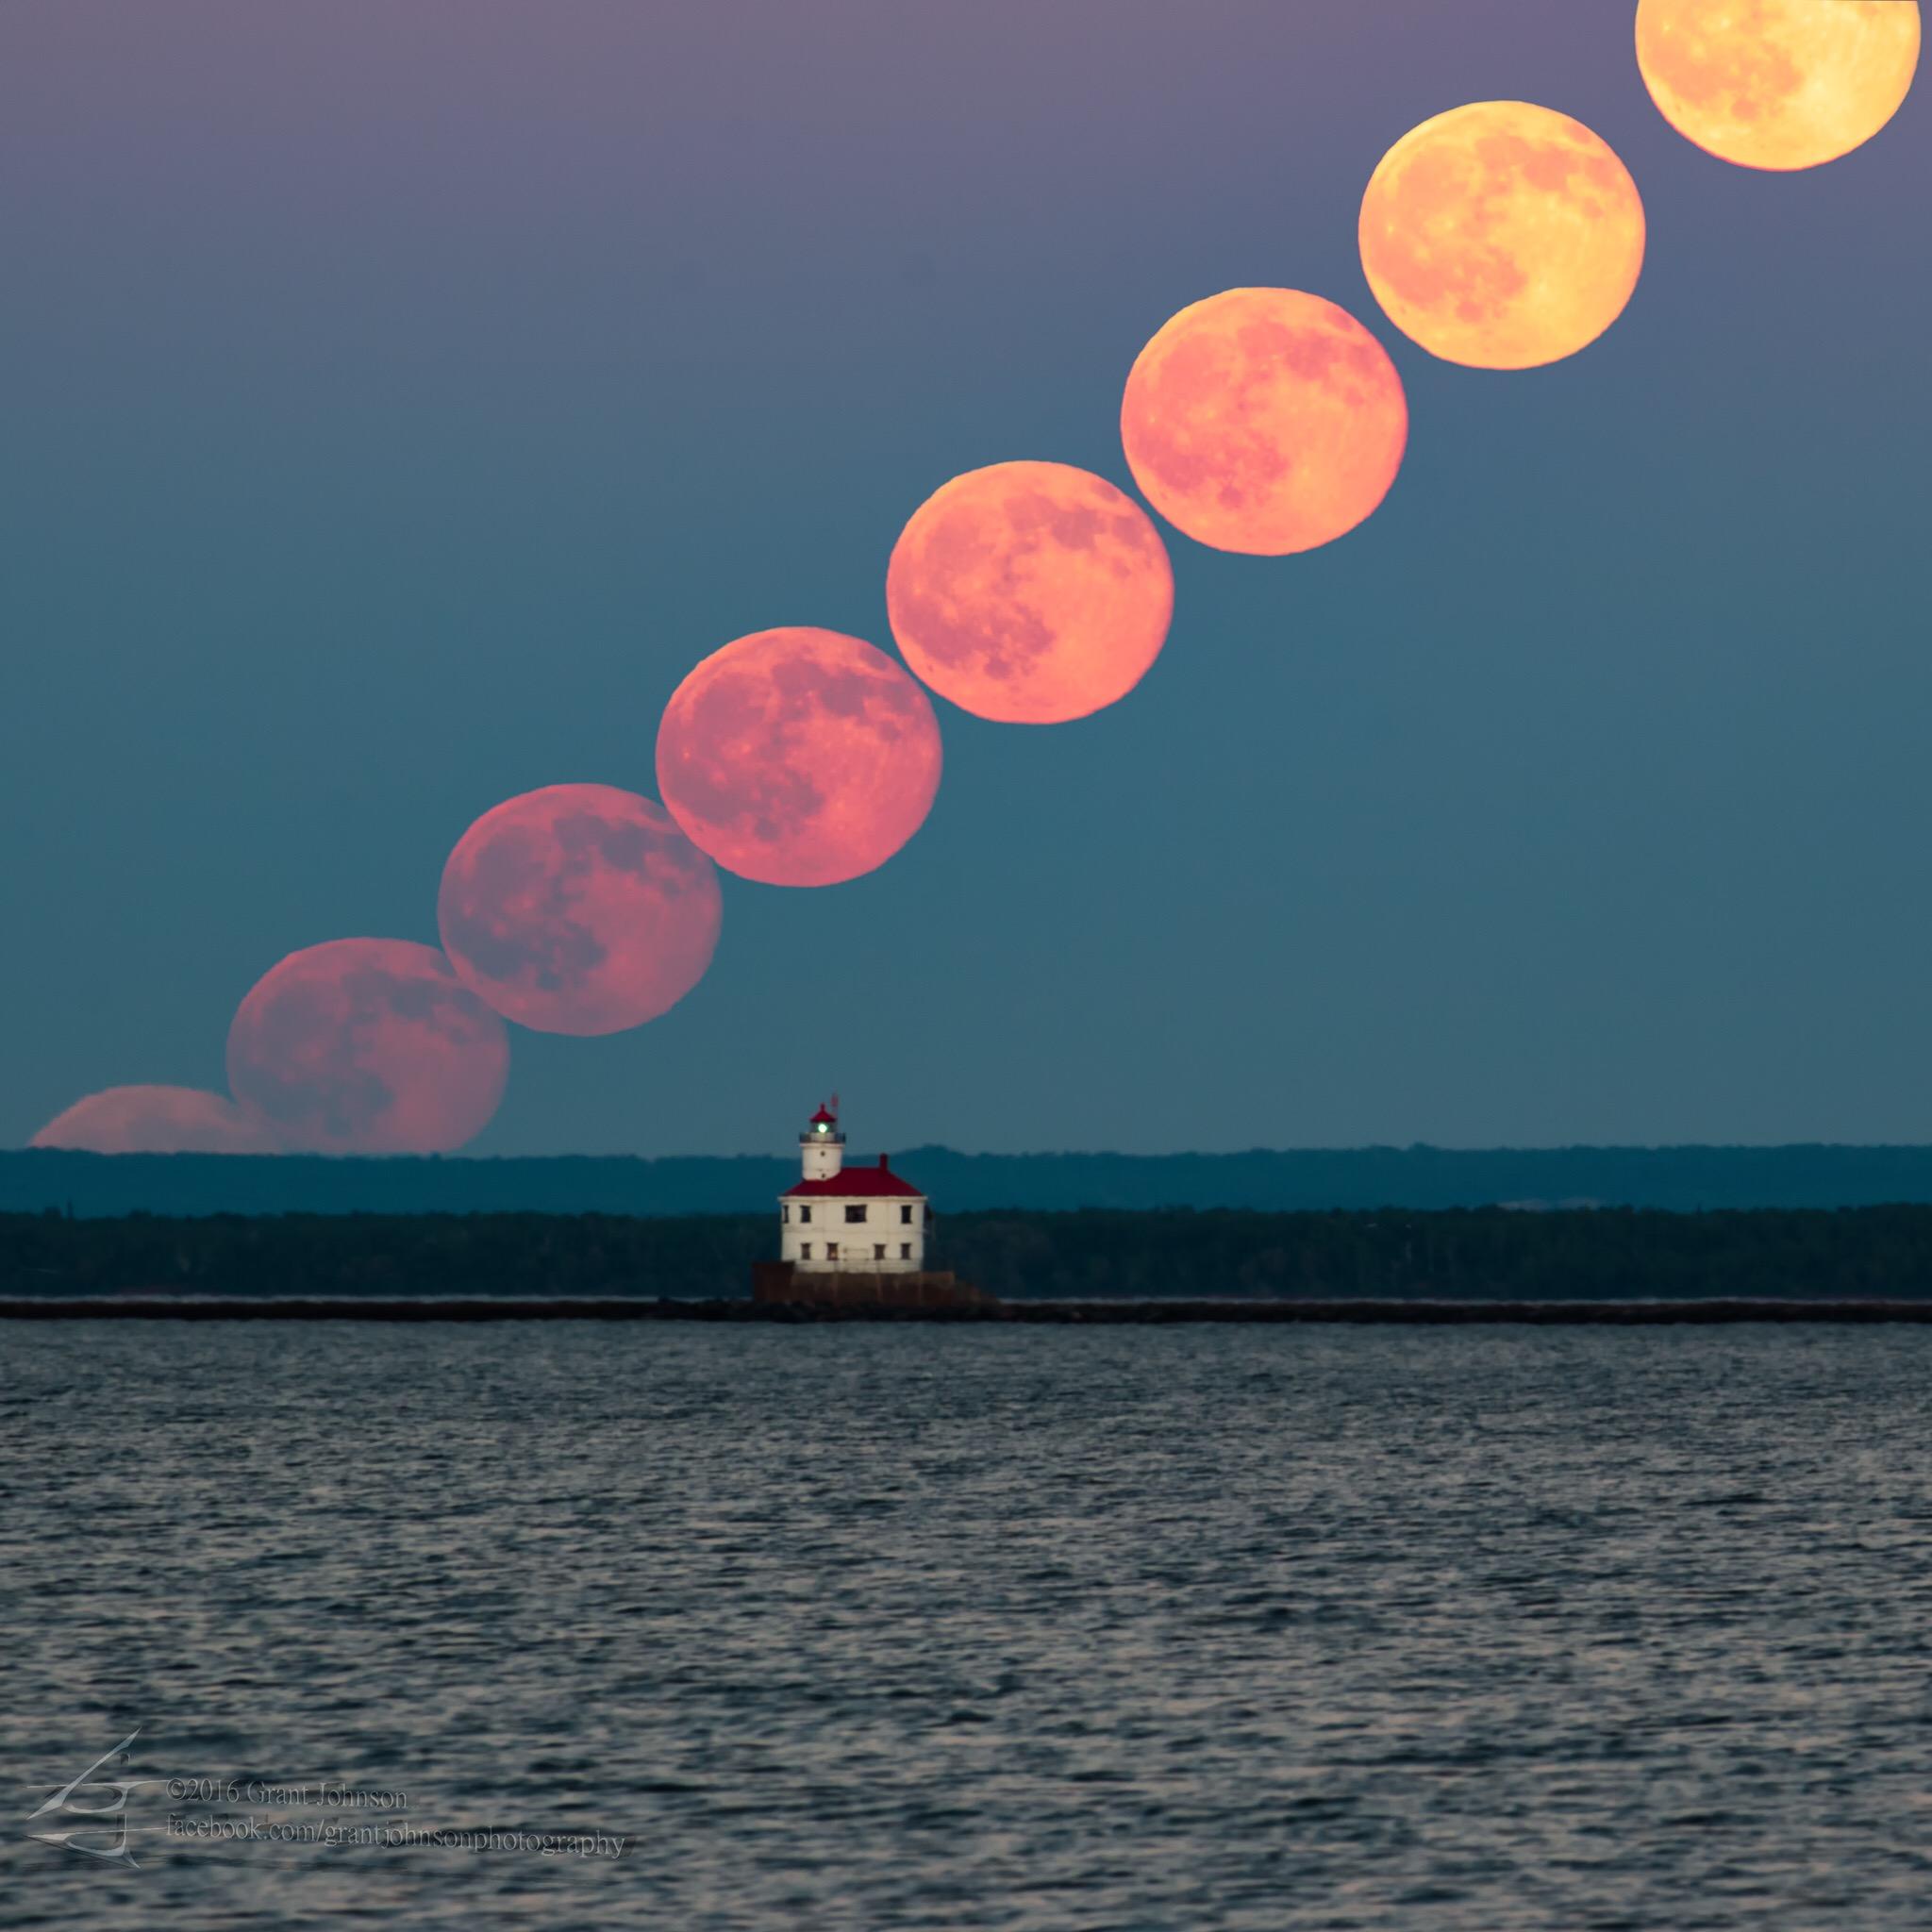 stawberry moon.jpg